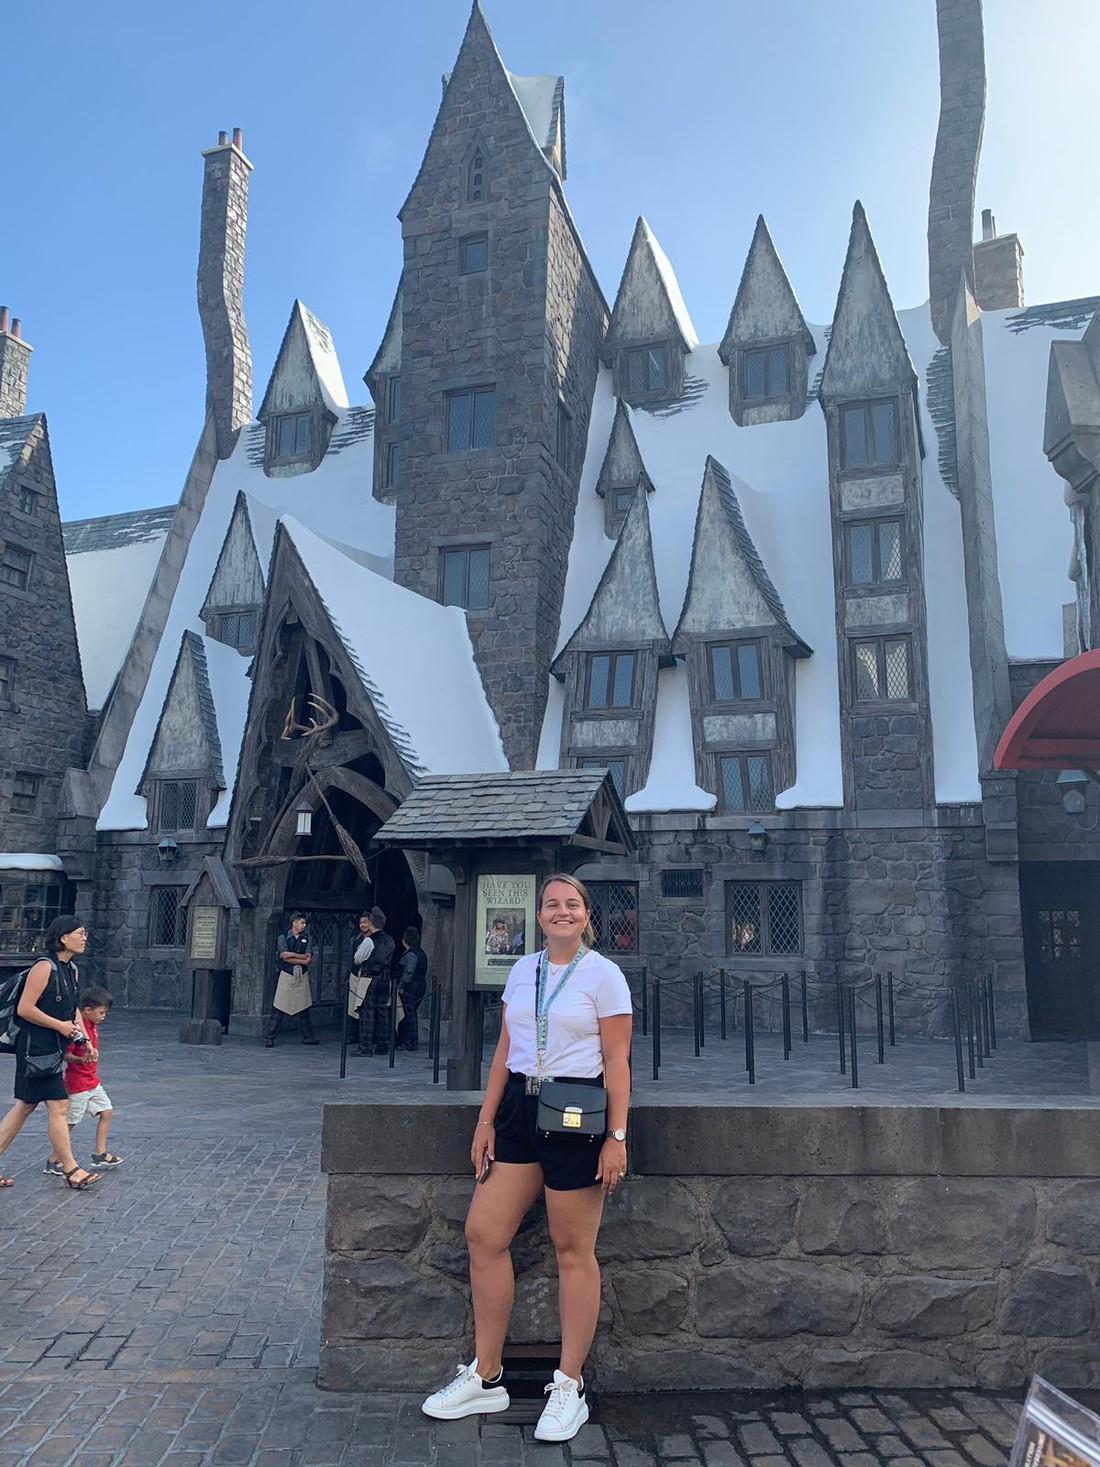 Harry Potter - Universal Studio's - Los Angeles - California - Amerika - Doets Reizen